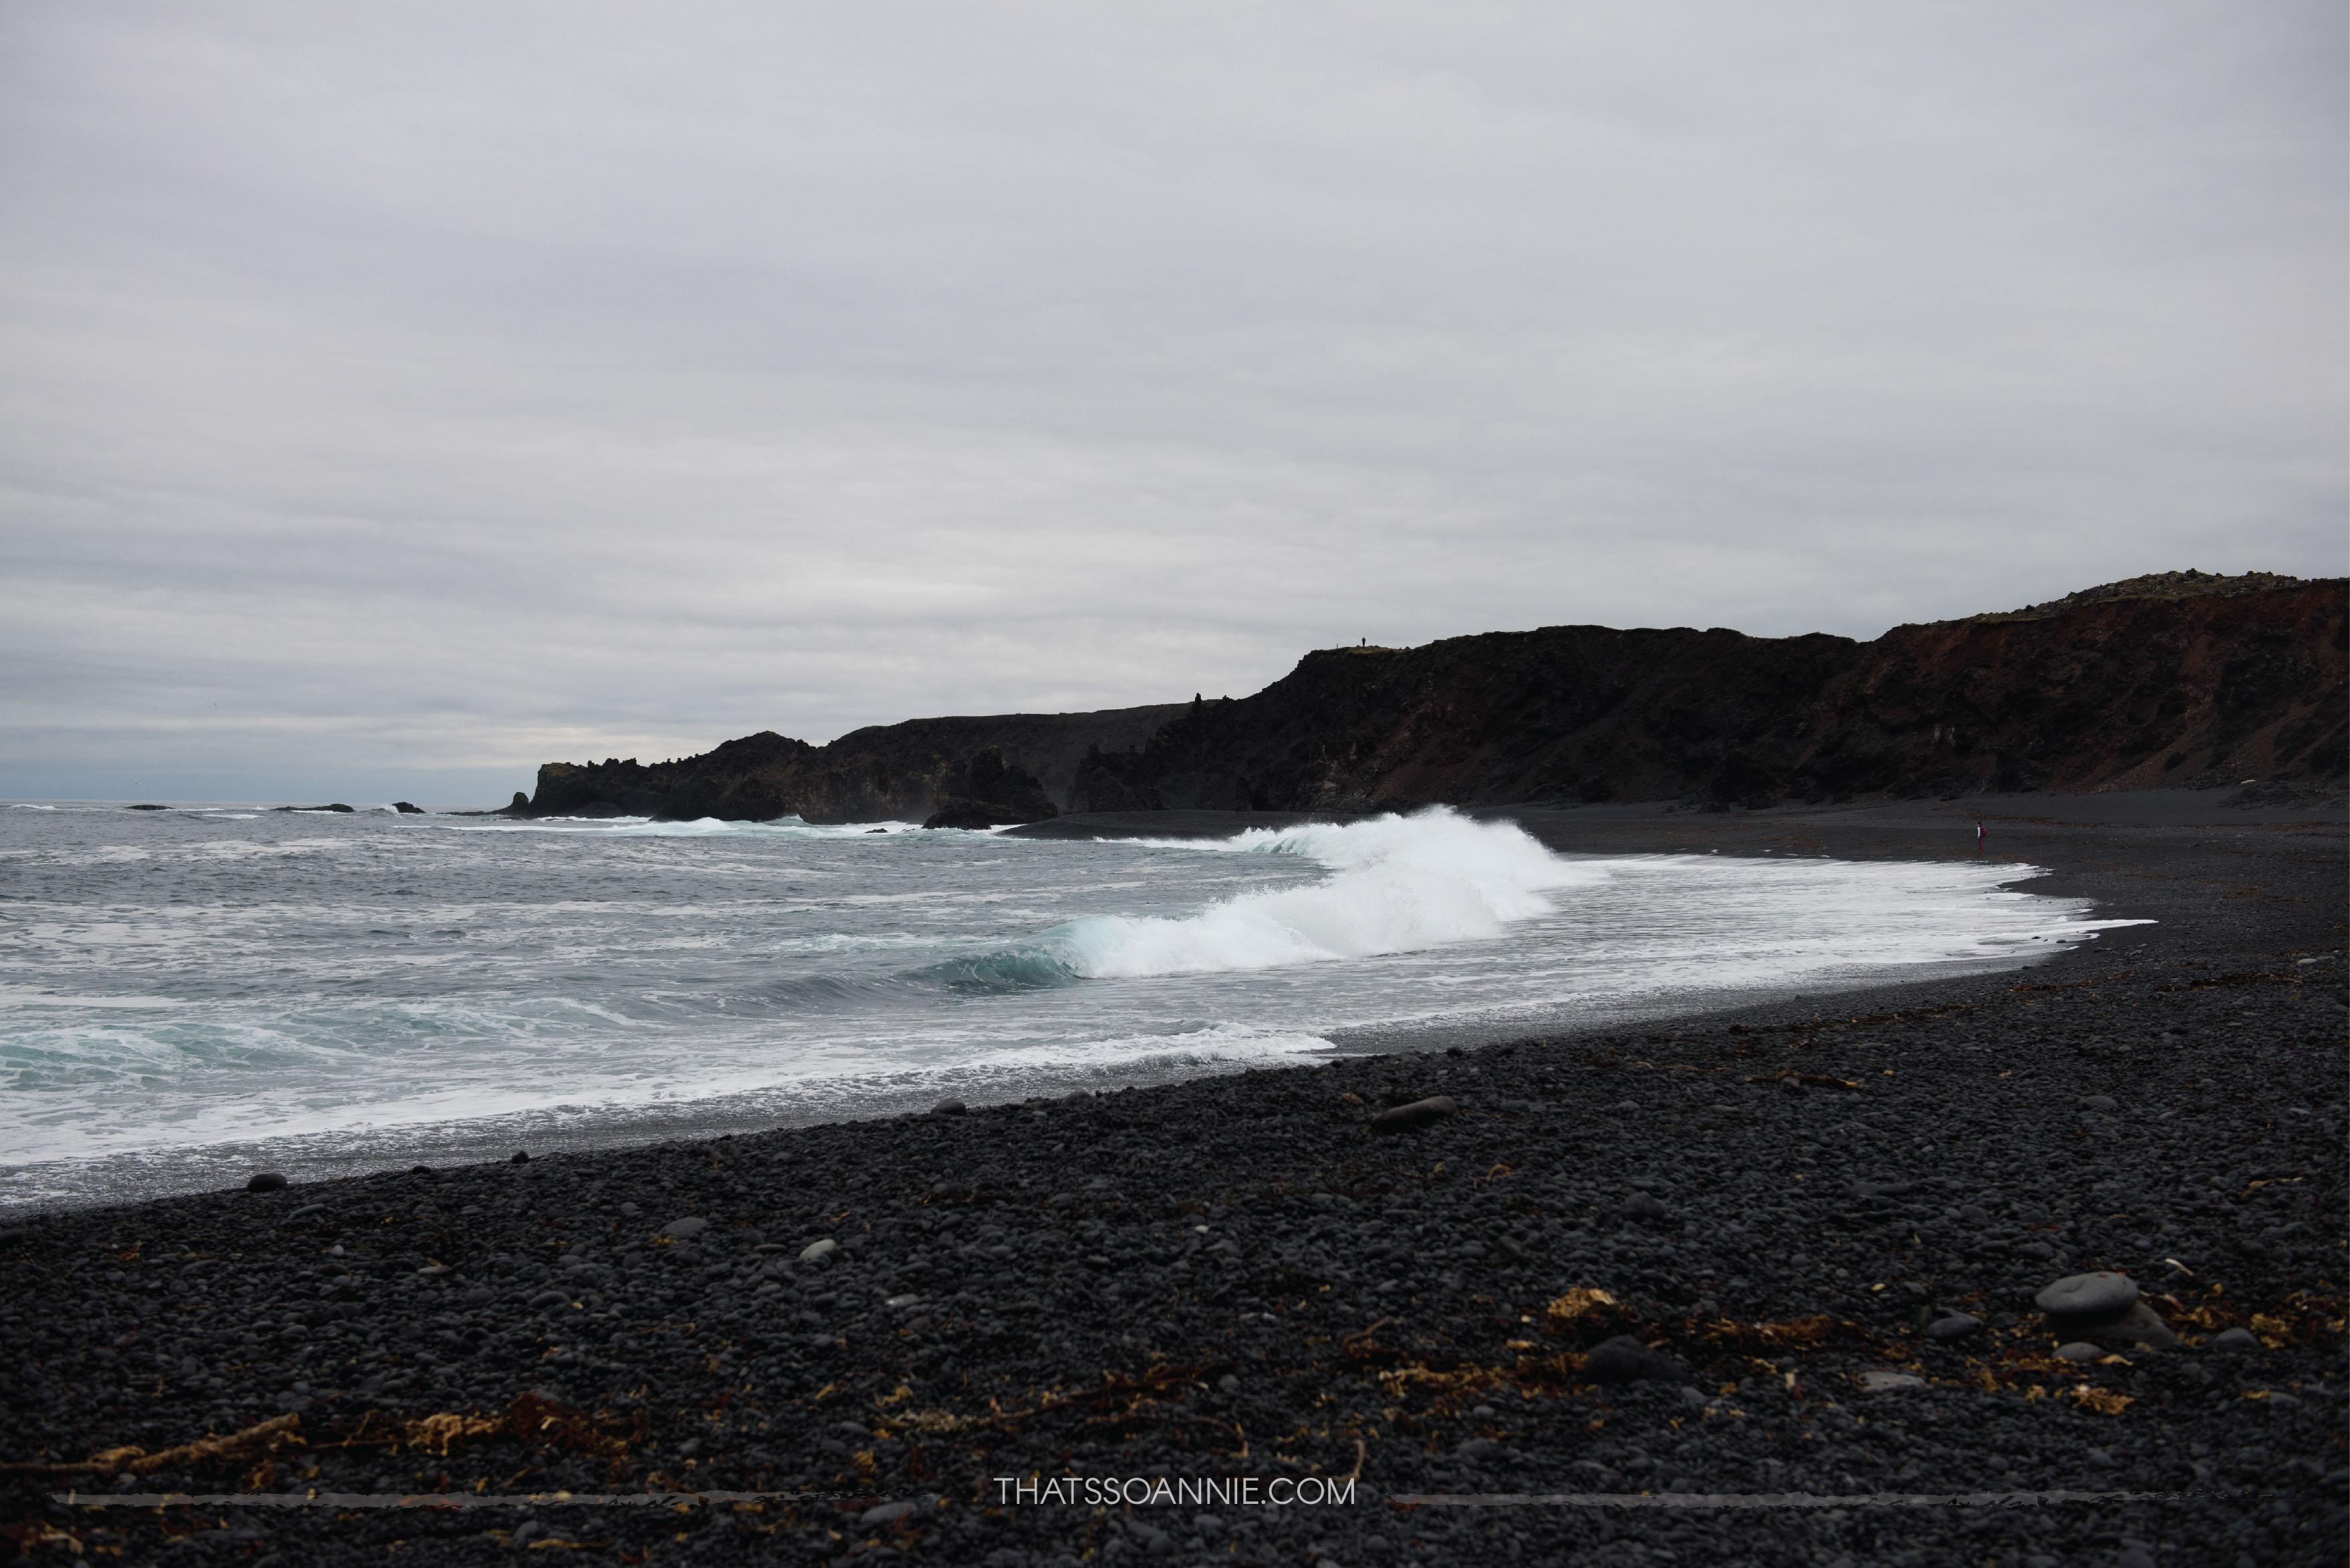 Djúpalónssandur, a black pebble beach | Exploring the Snæfellsnes Peninsula, Iceland | www.thatssoannie.com